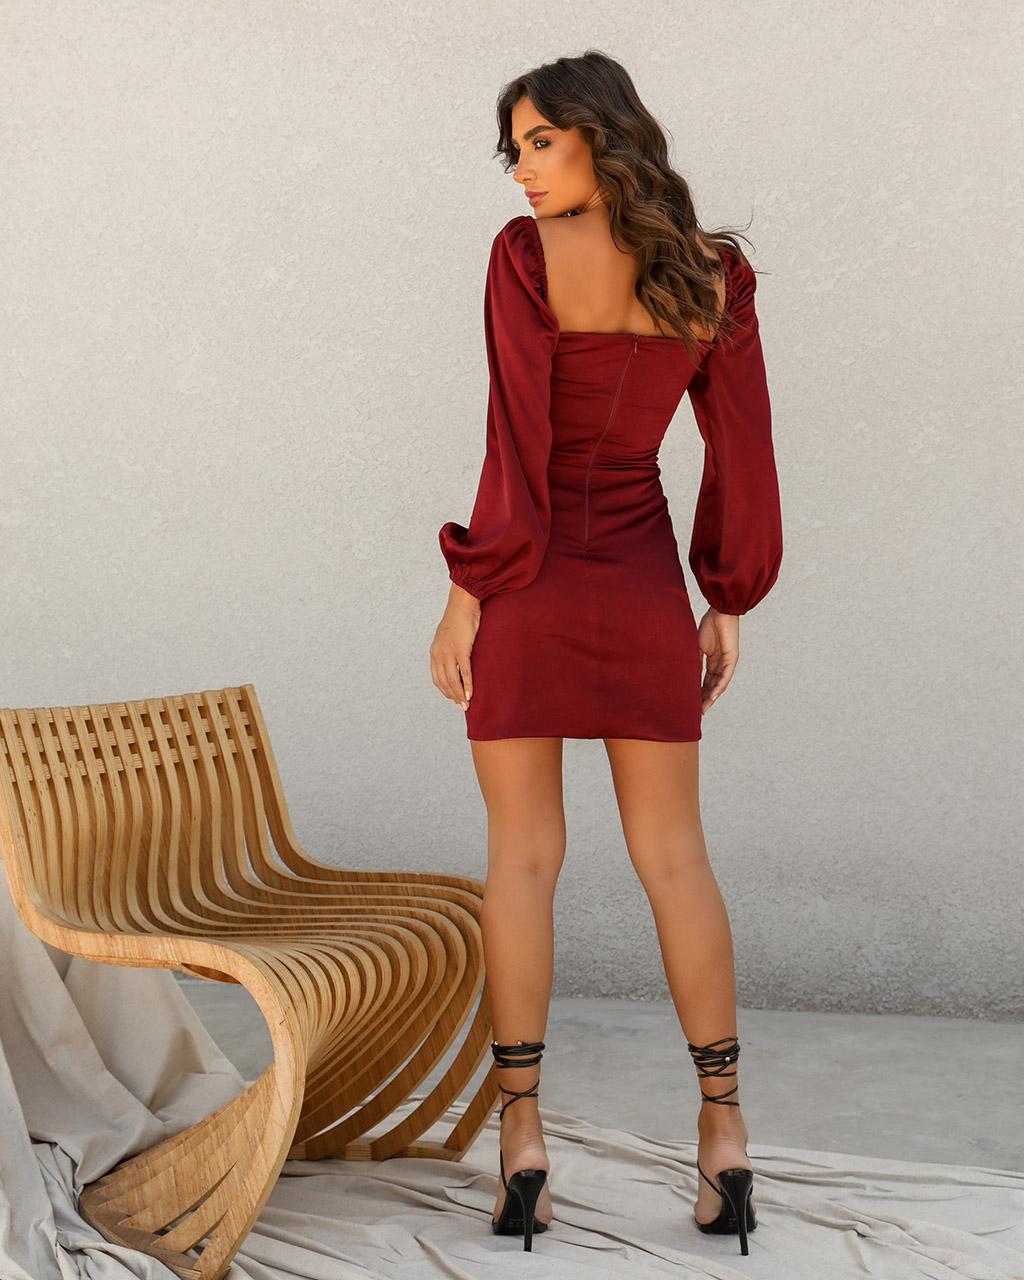 Vestido Tania  - Empório NM